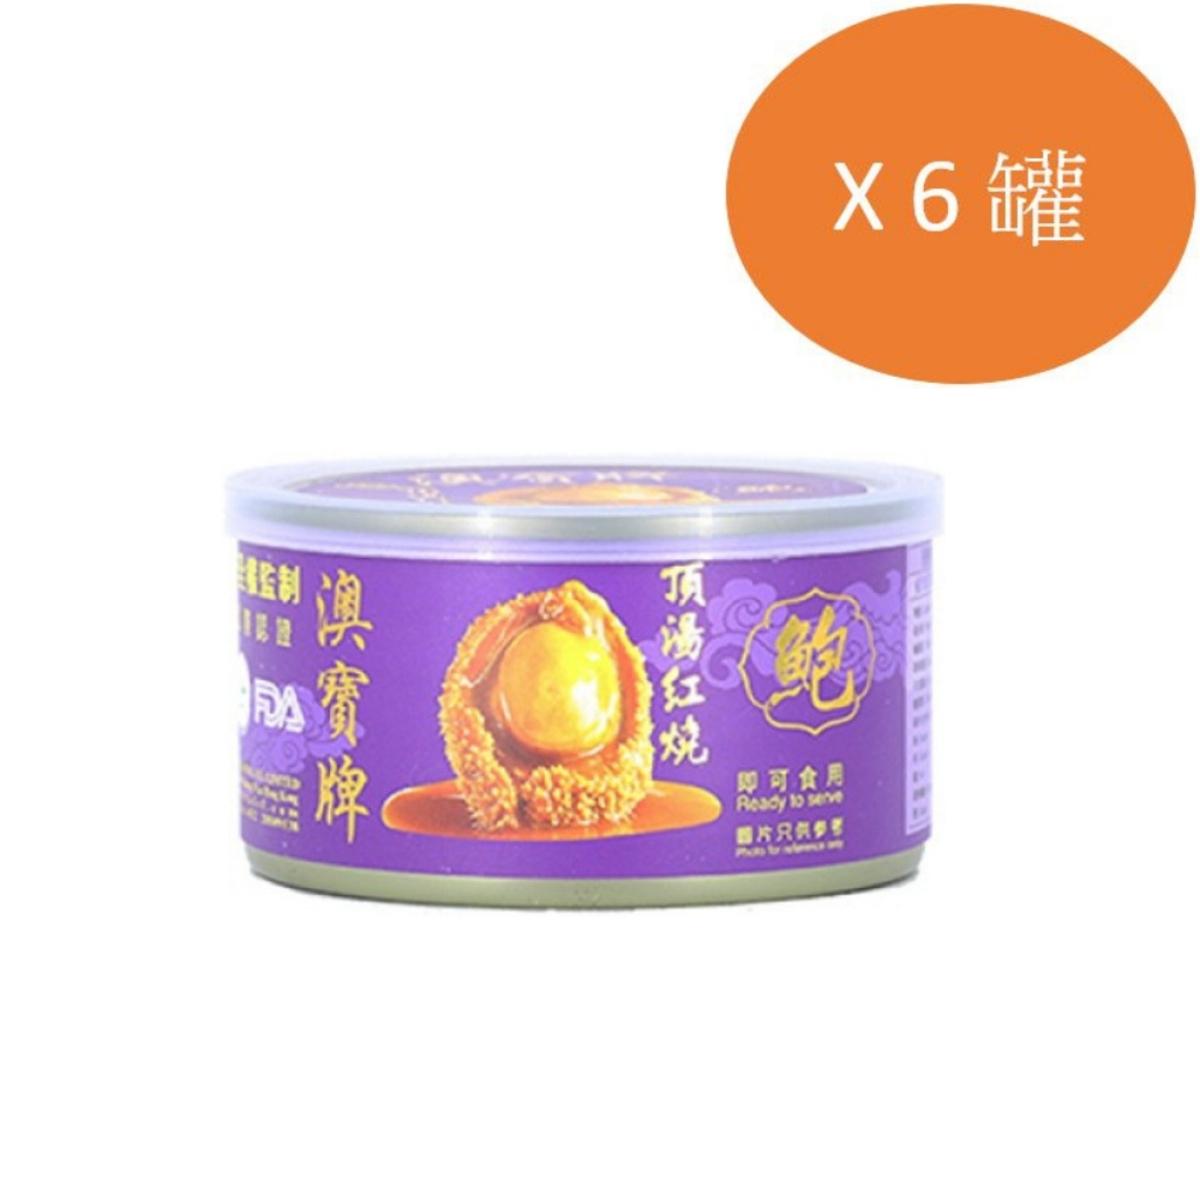 Braised abalone 40g (6 Pcs) x 6